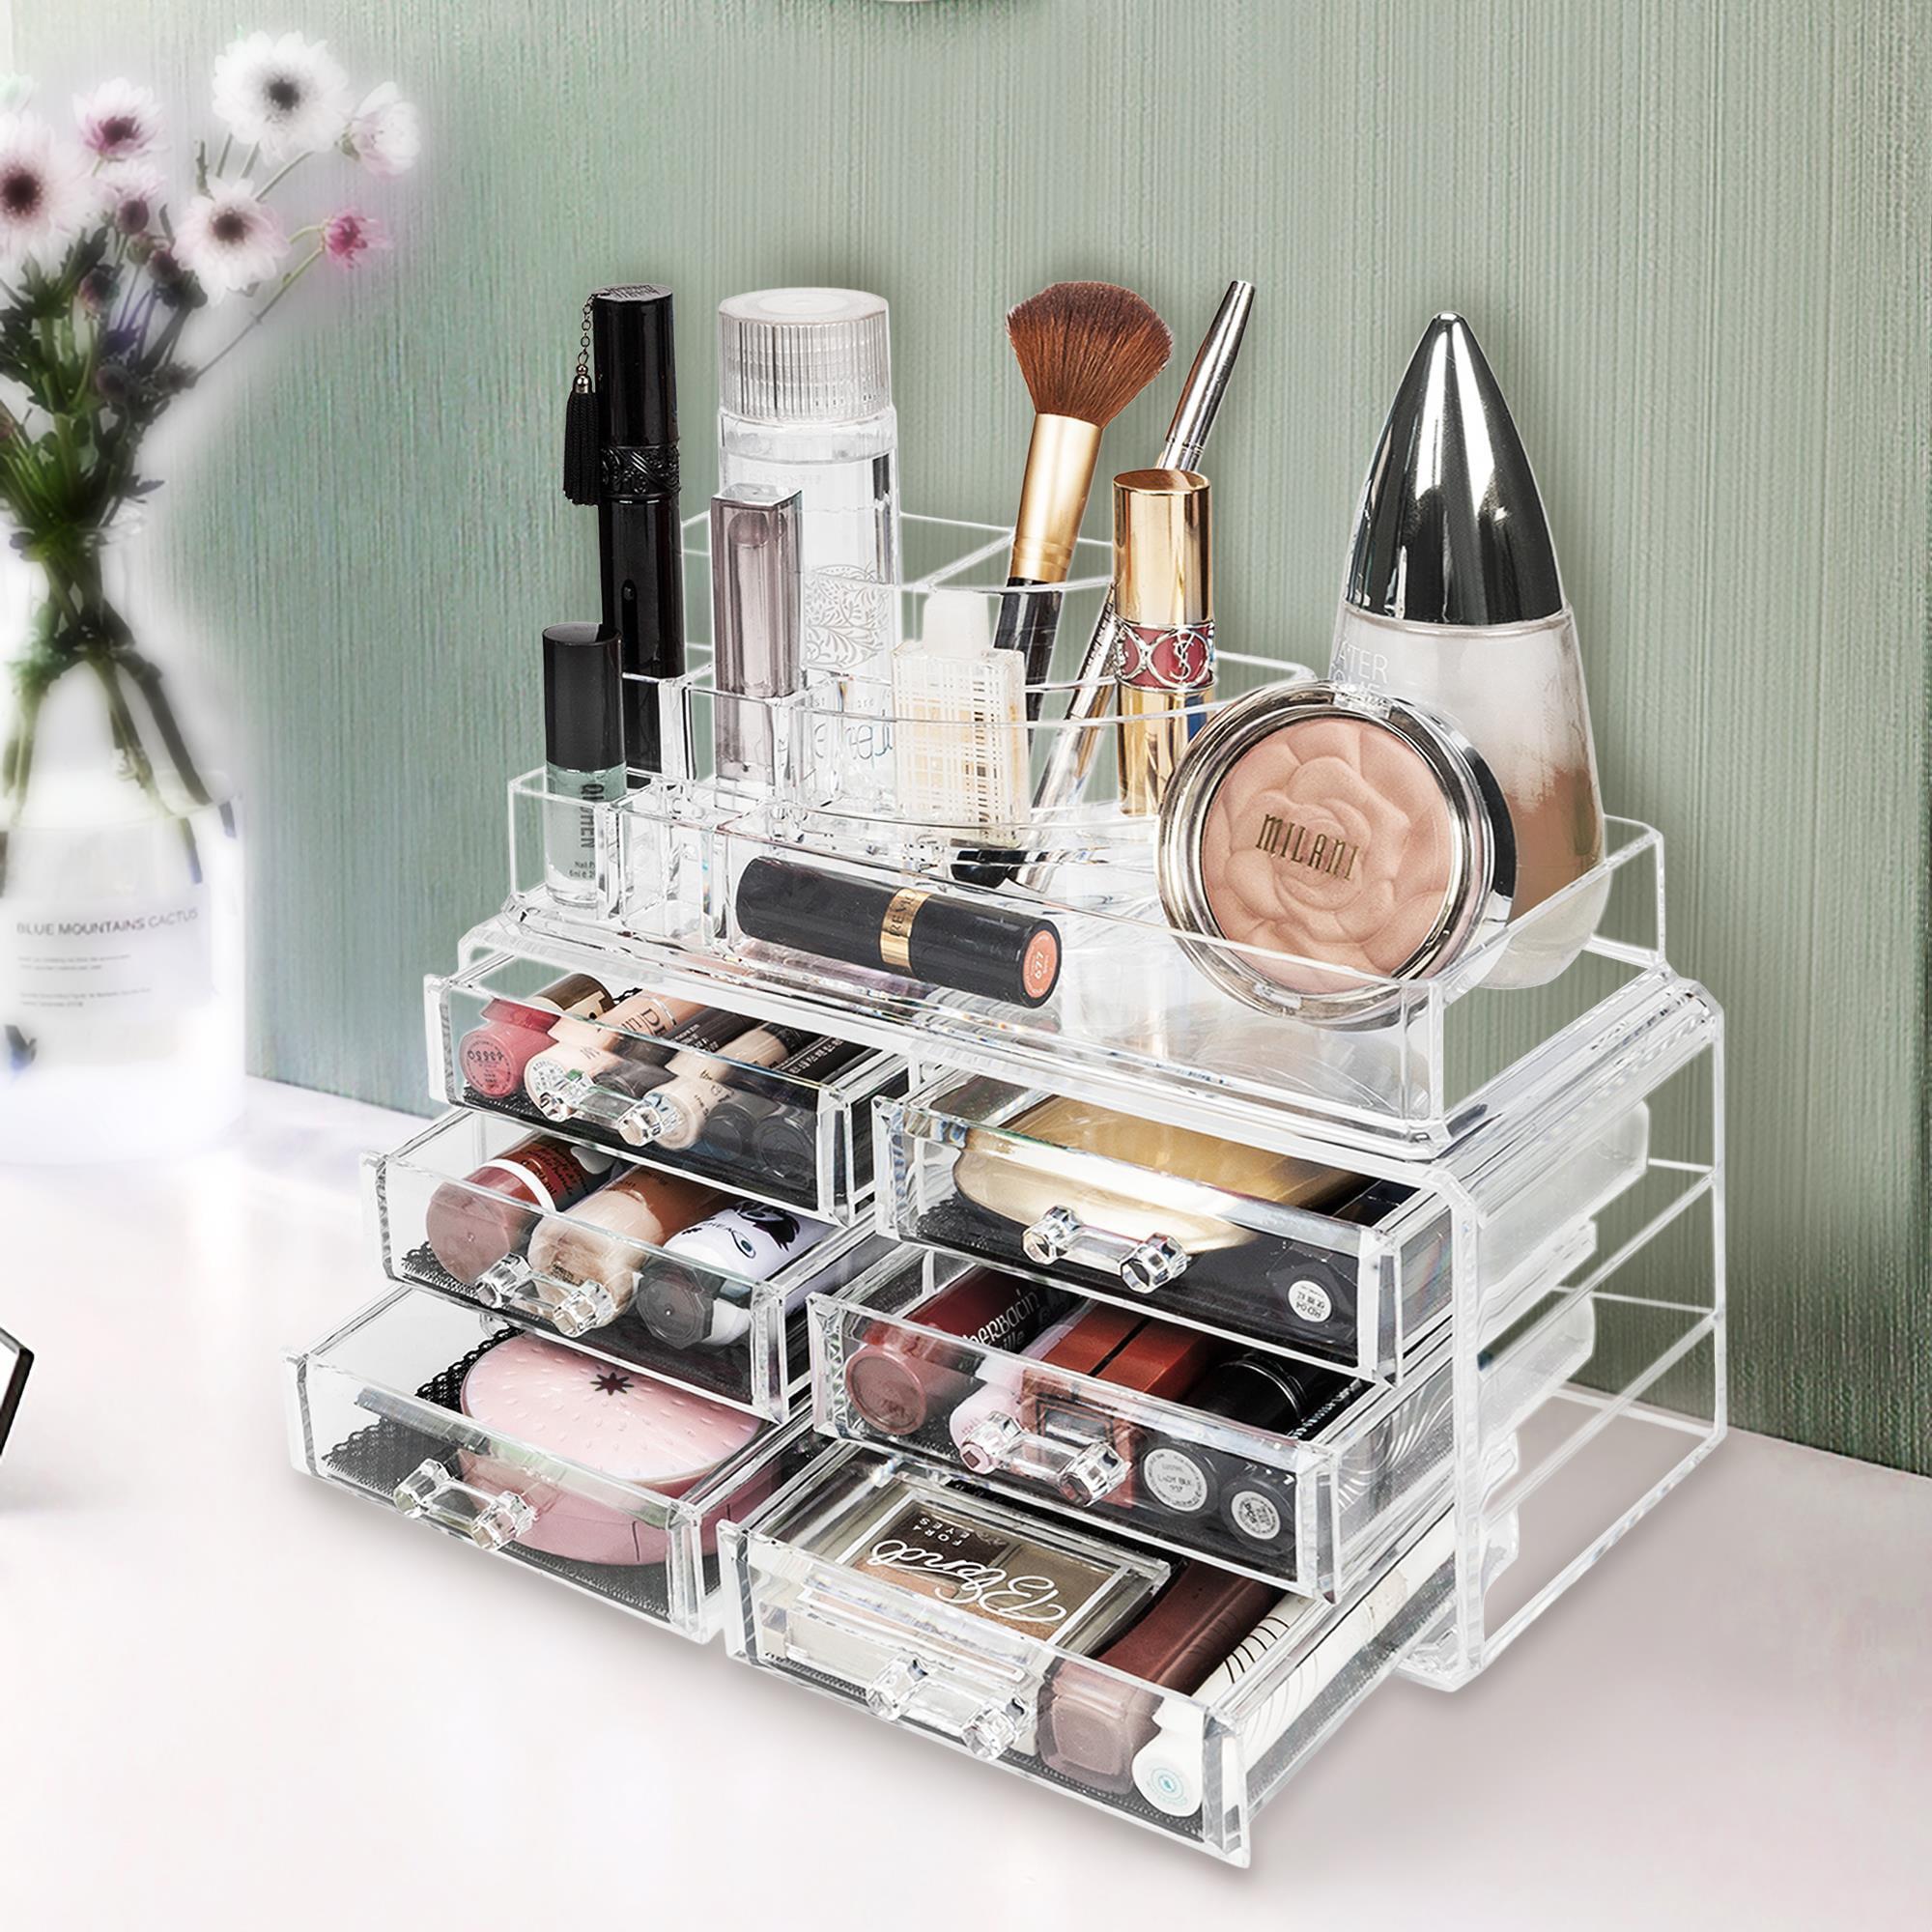 Ktaxon Acrylic Makeup Organizer